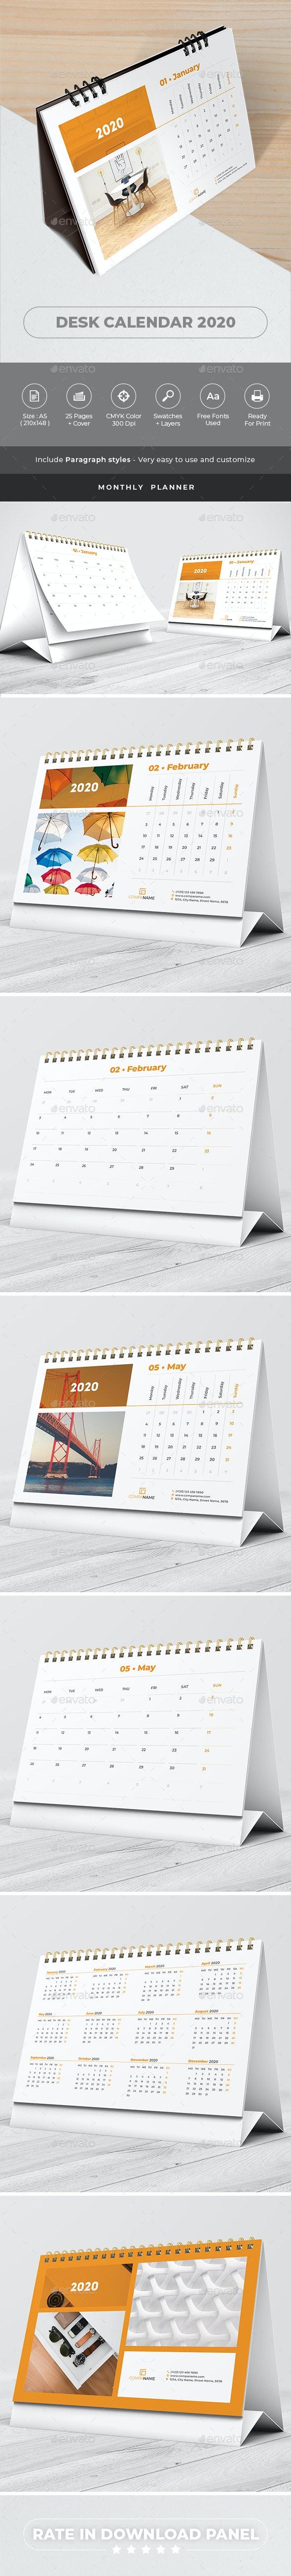 Desk Calendar 2020 Planner - Calendars Stationery